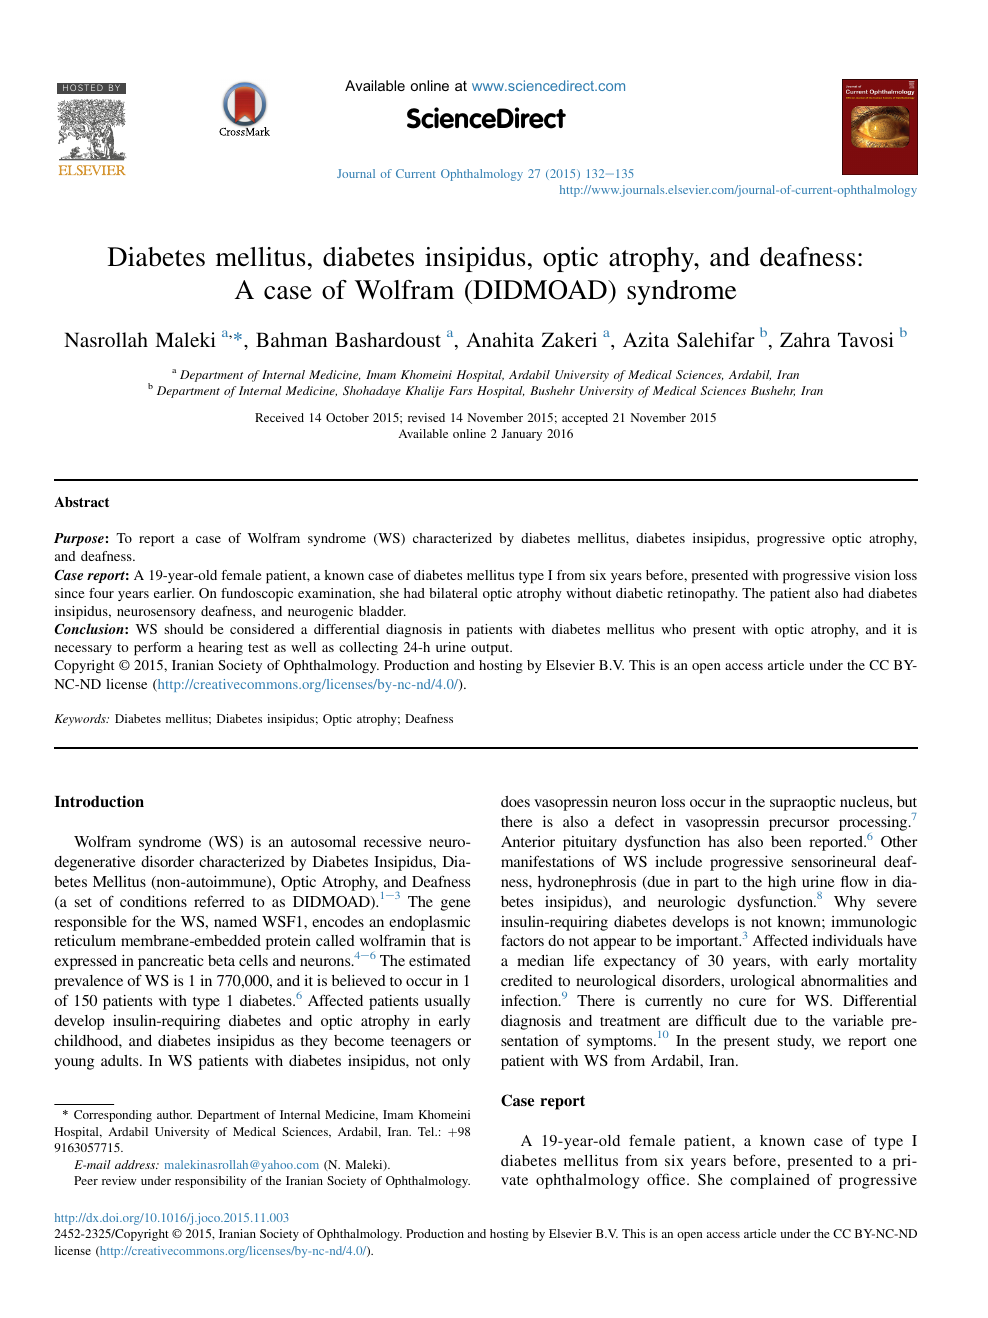 Diabetes Mellitus Diabetes Insipidus Optic Atrophy And Deafness